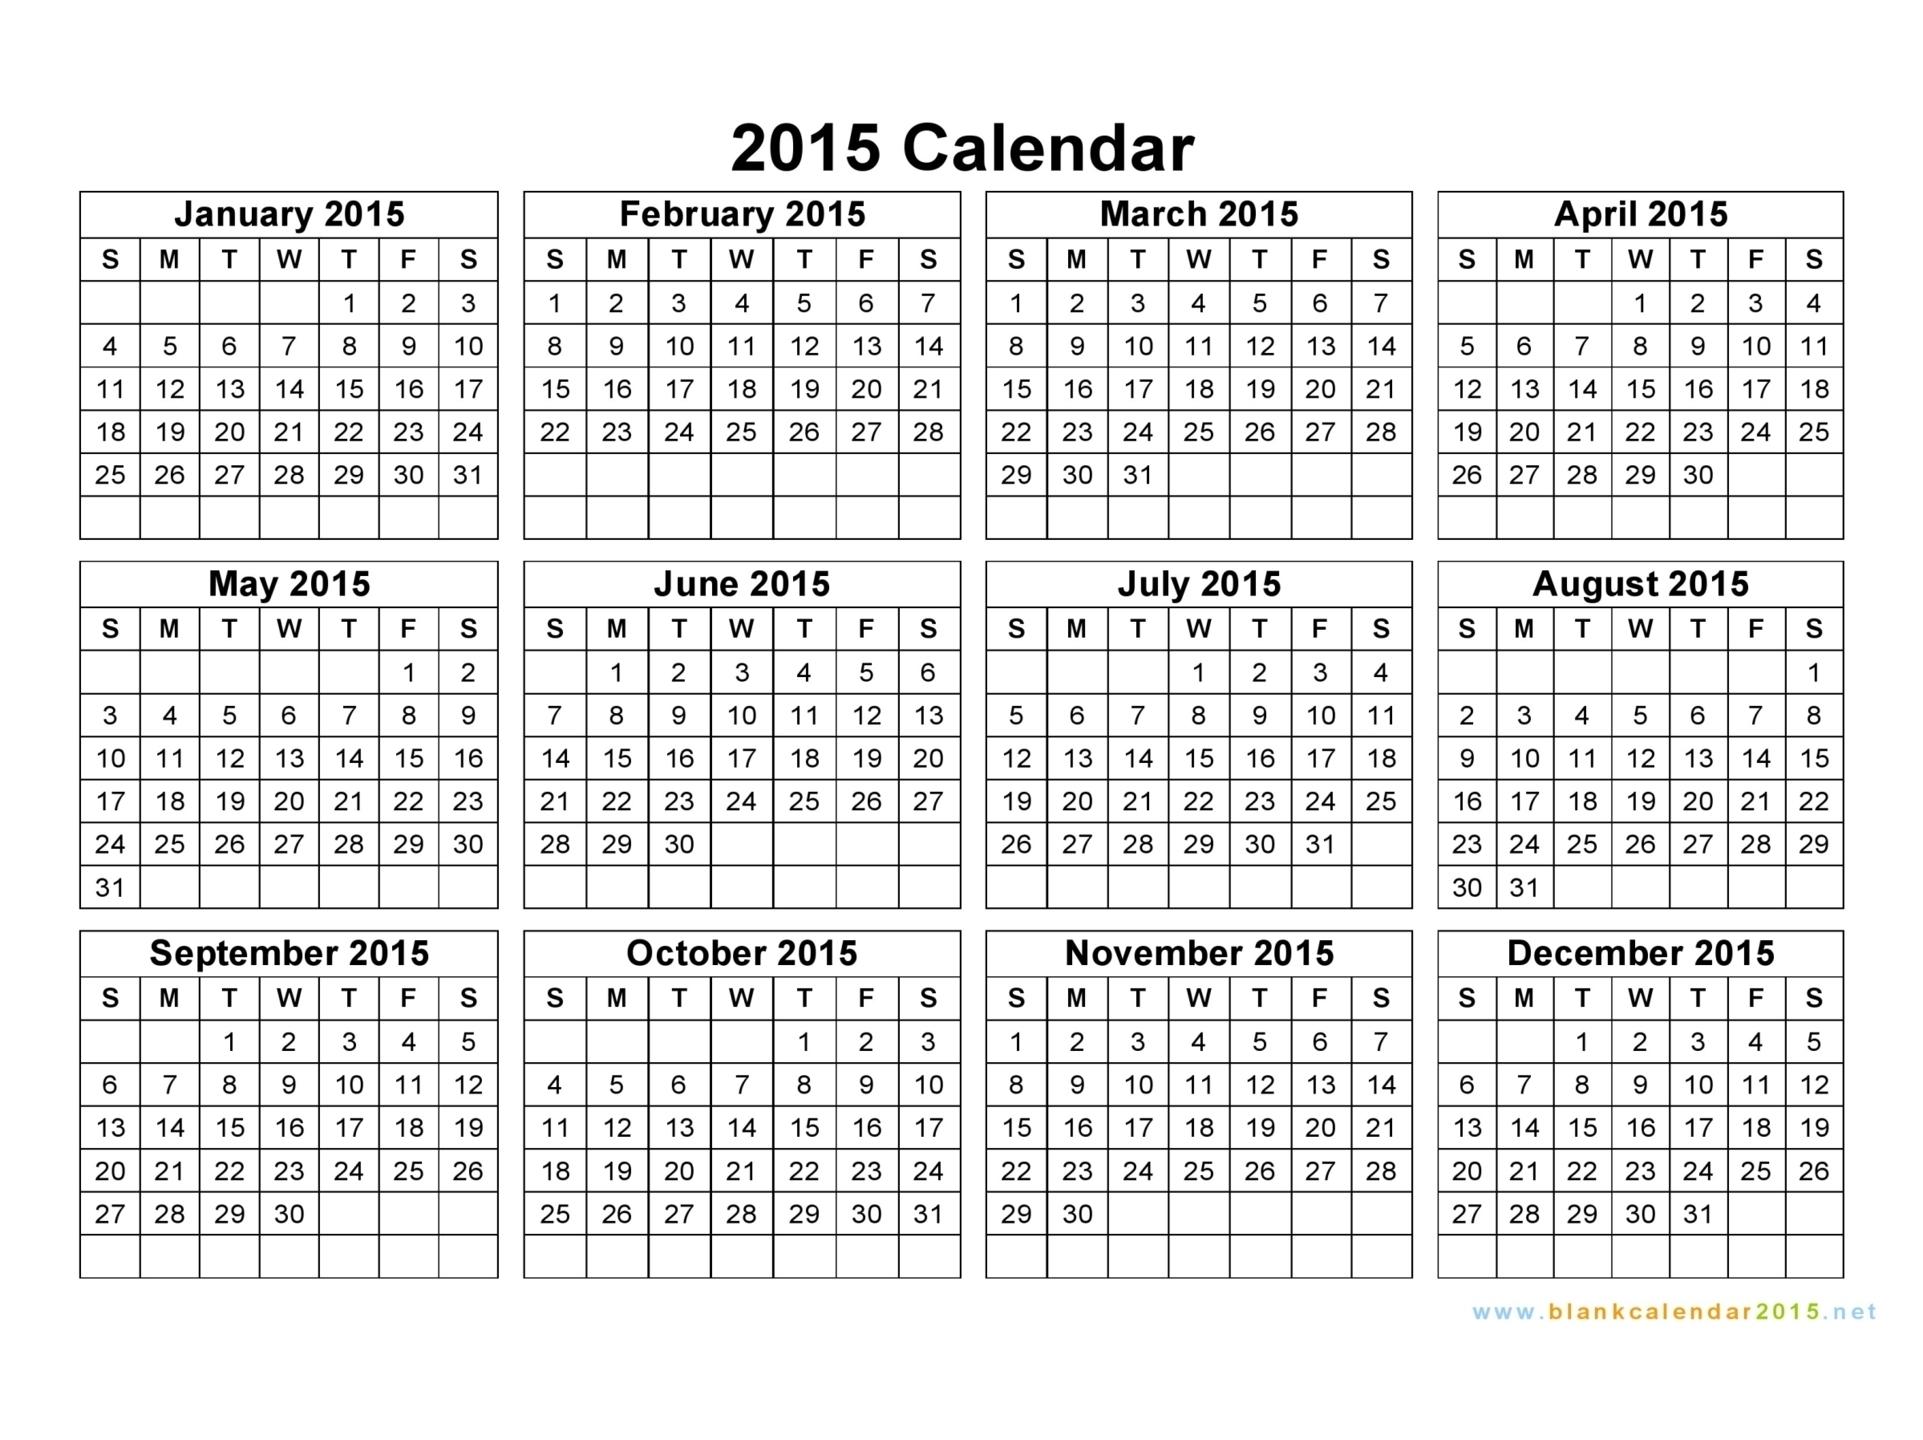 5 Year Calendar On One Page Ten Free Printable Calendar